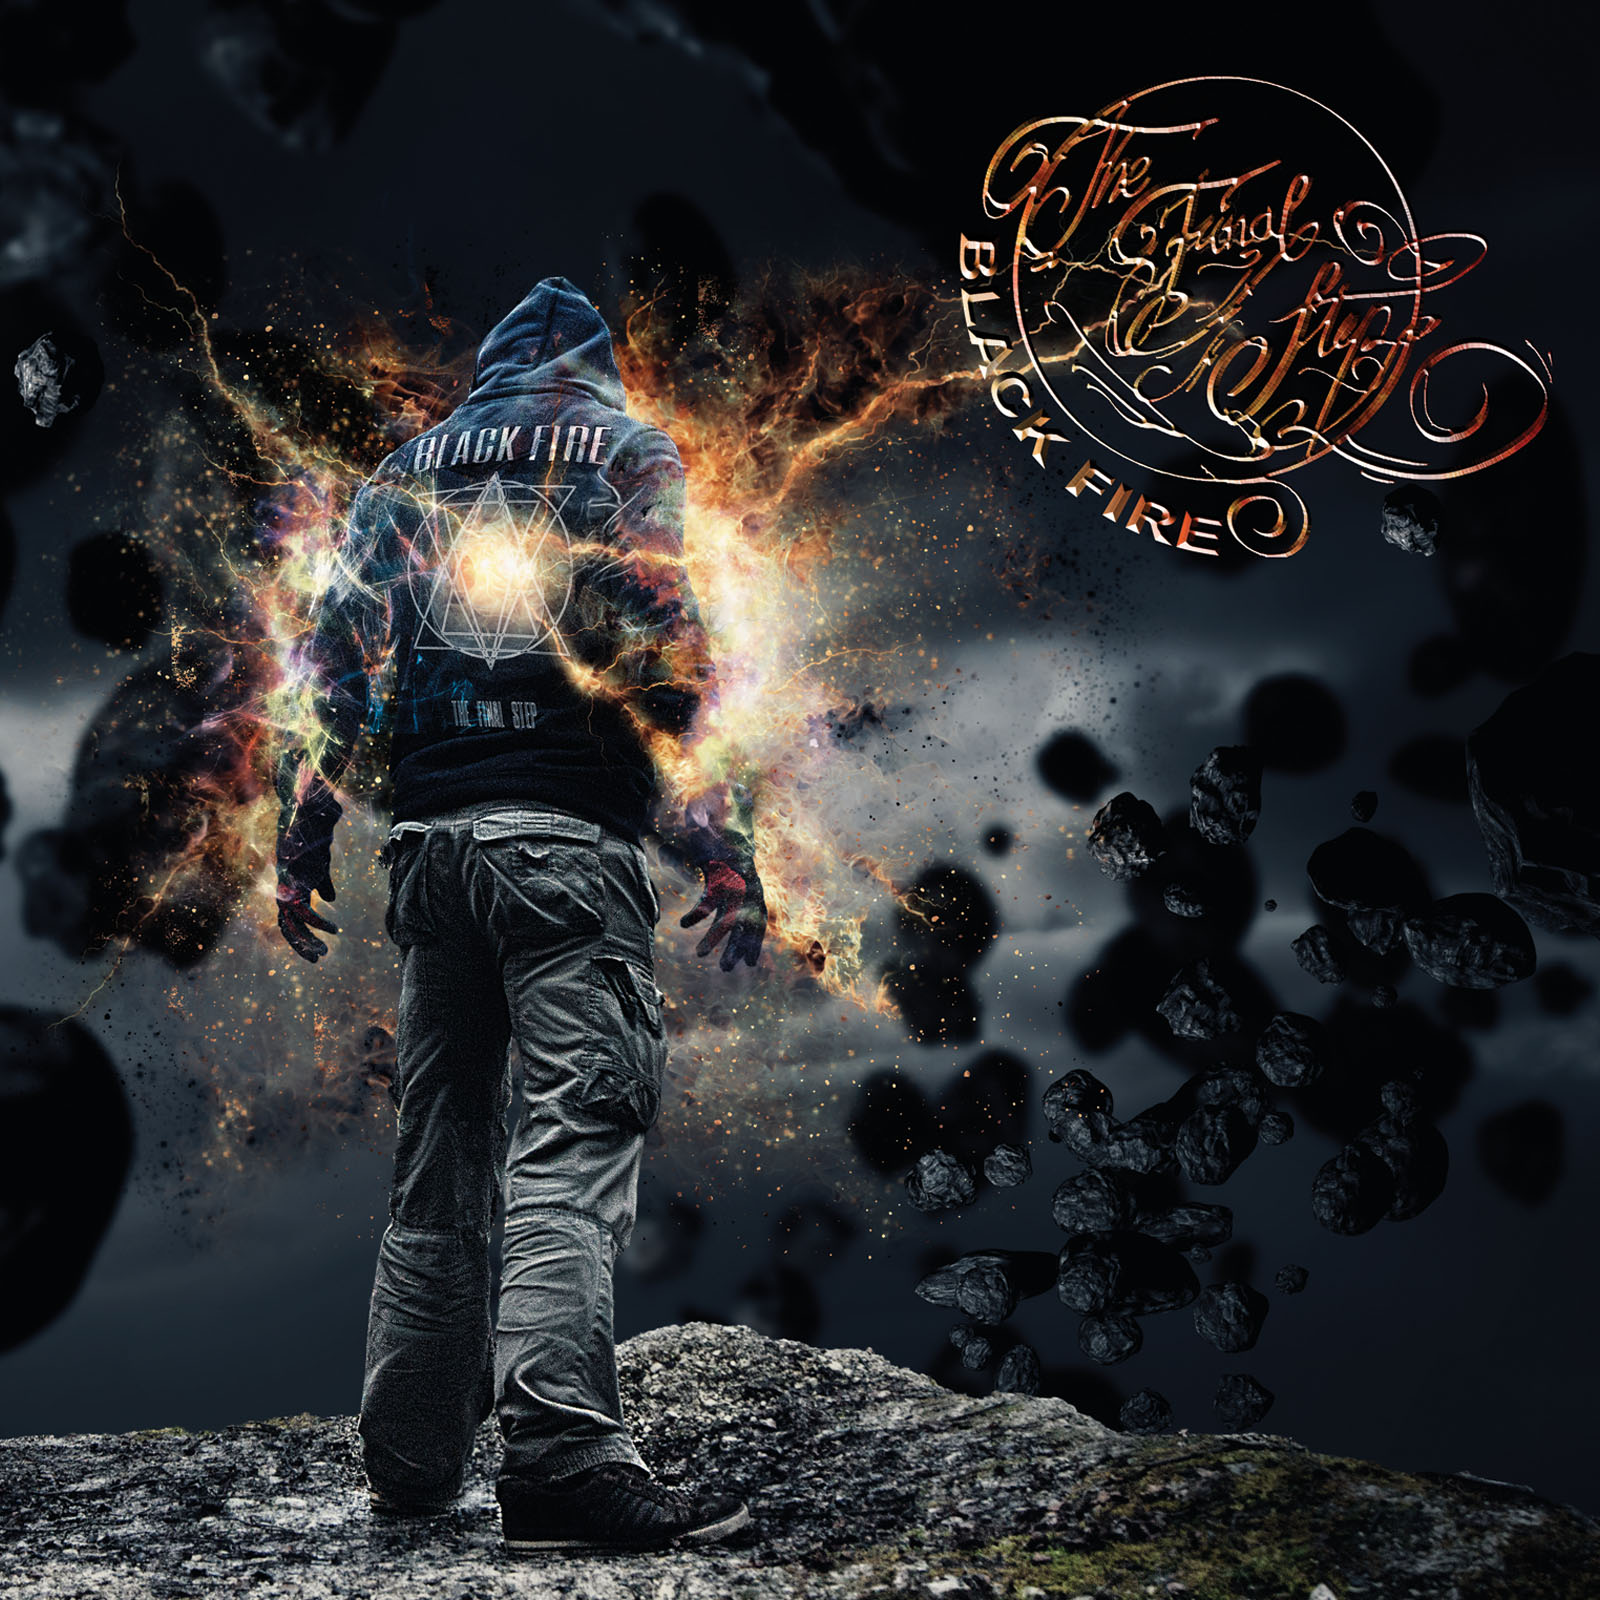 the_final_step-black_fire